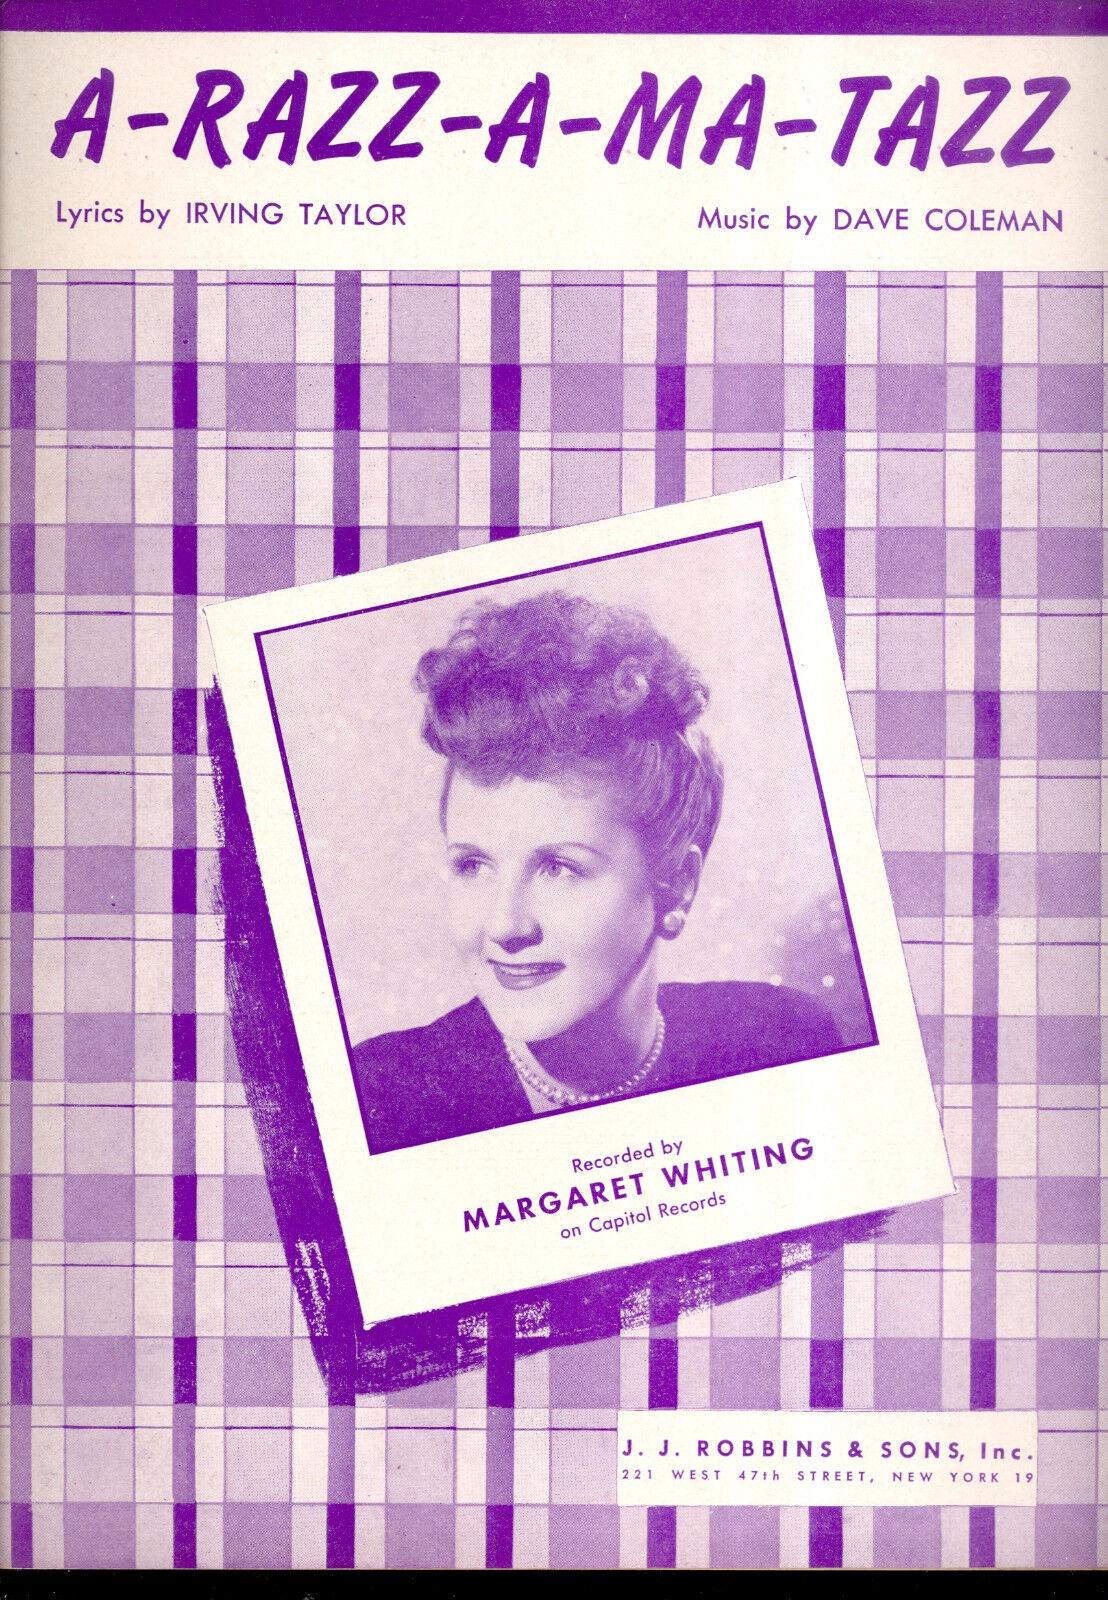 Margaret Whiting partituras  un-Razz-a-Ma un-Razz-a-Ma un-Razz-a-Ma - Tazz   Obtén lo ultimo